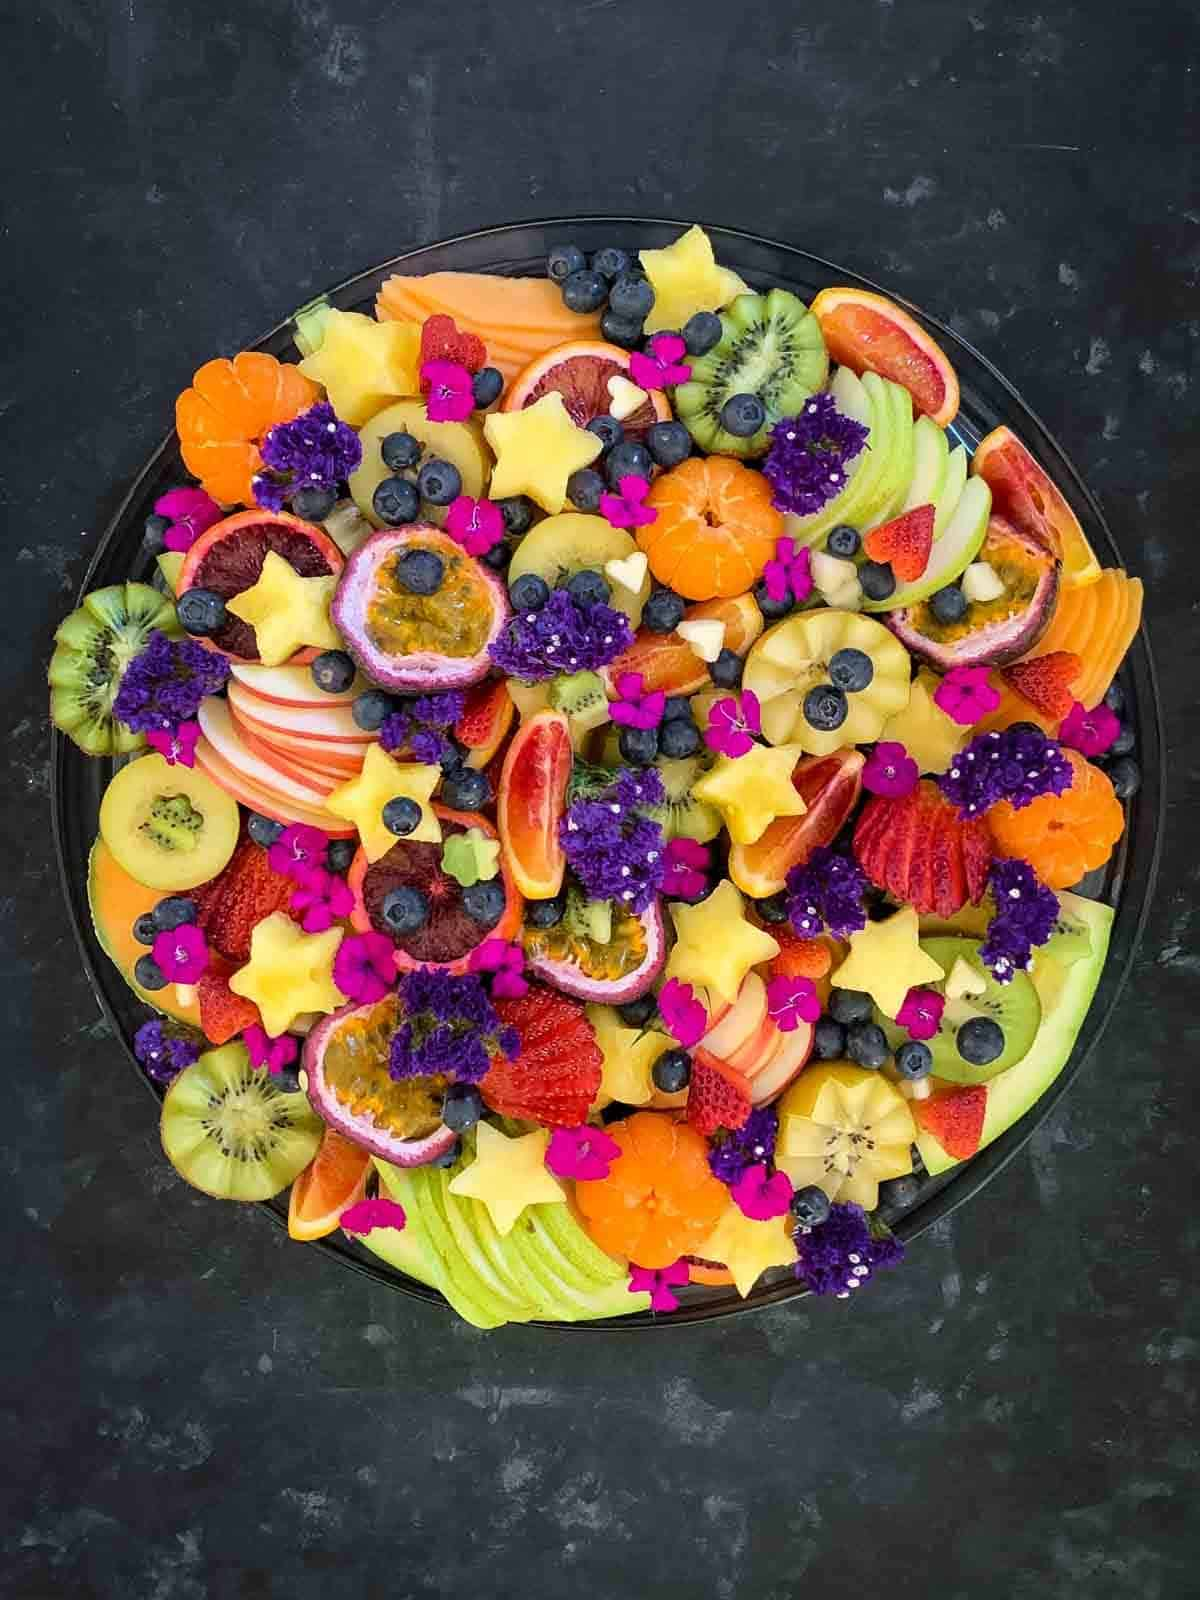 Fruit Platter Presentation Ideas